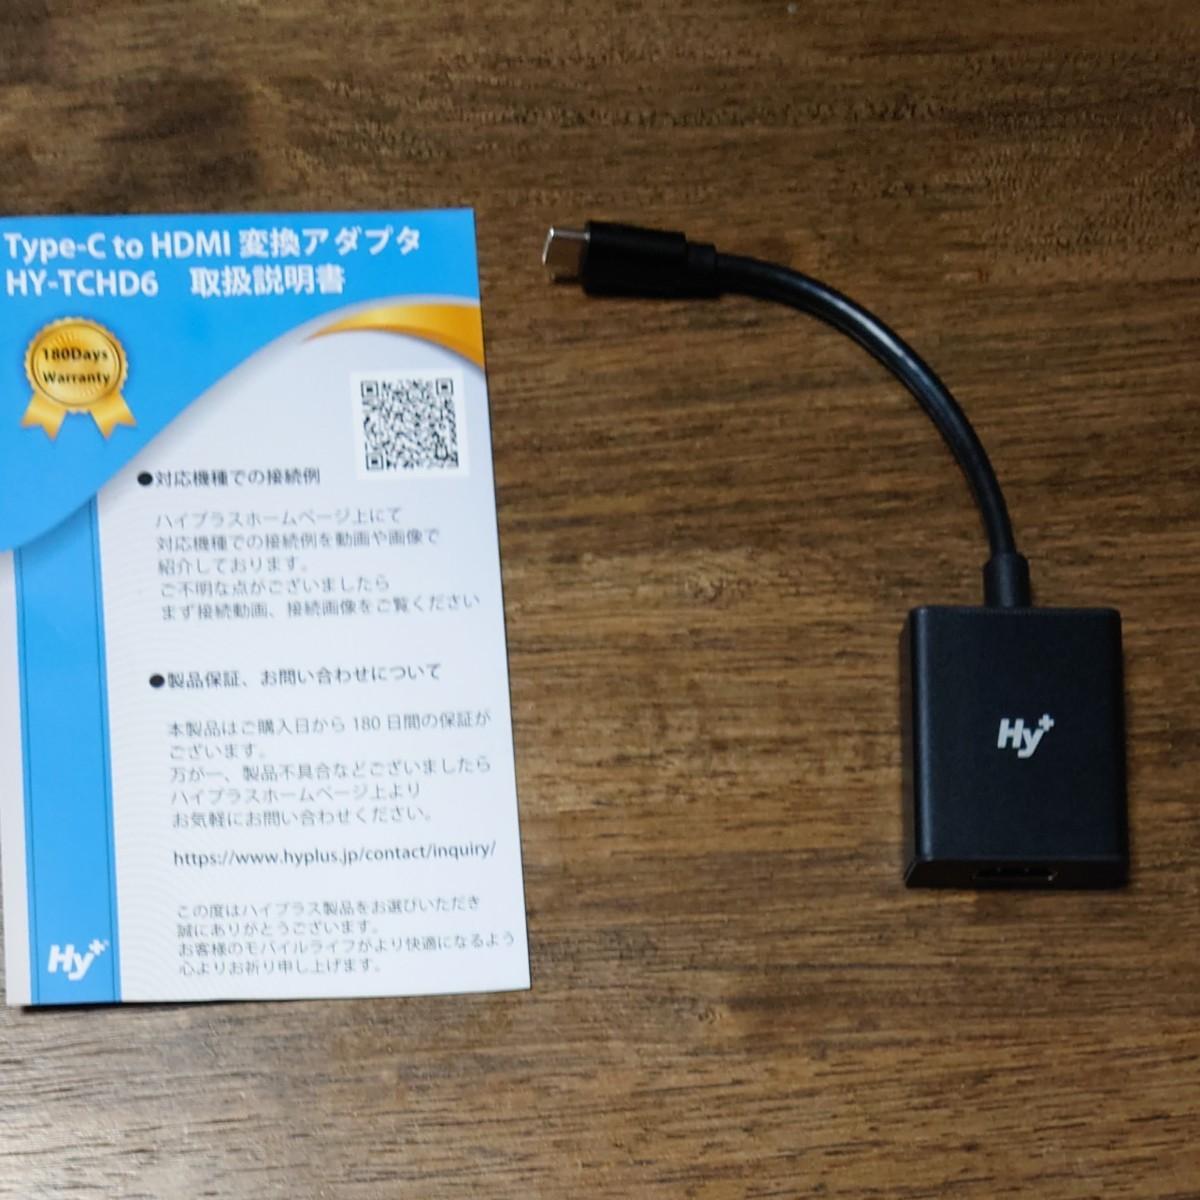 Hy+ Type-C to HDMI 変換アダプタ- HY-TCDH6 4K映像対応